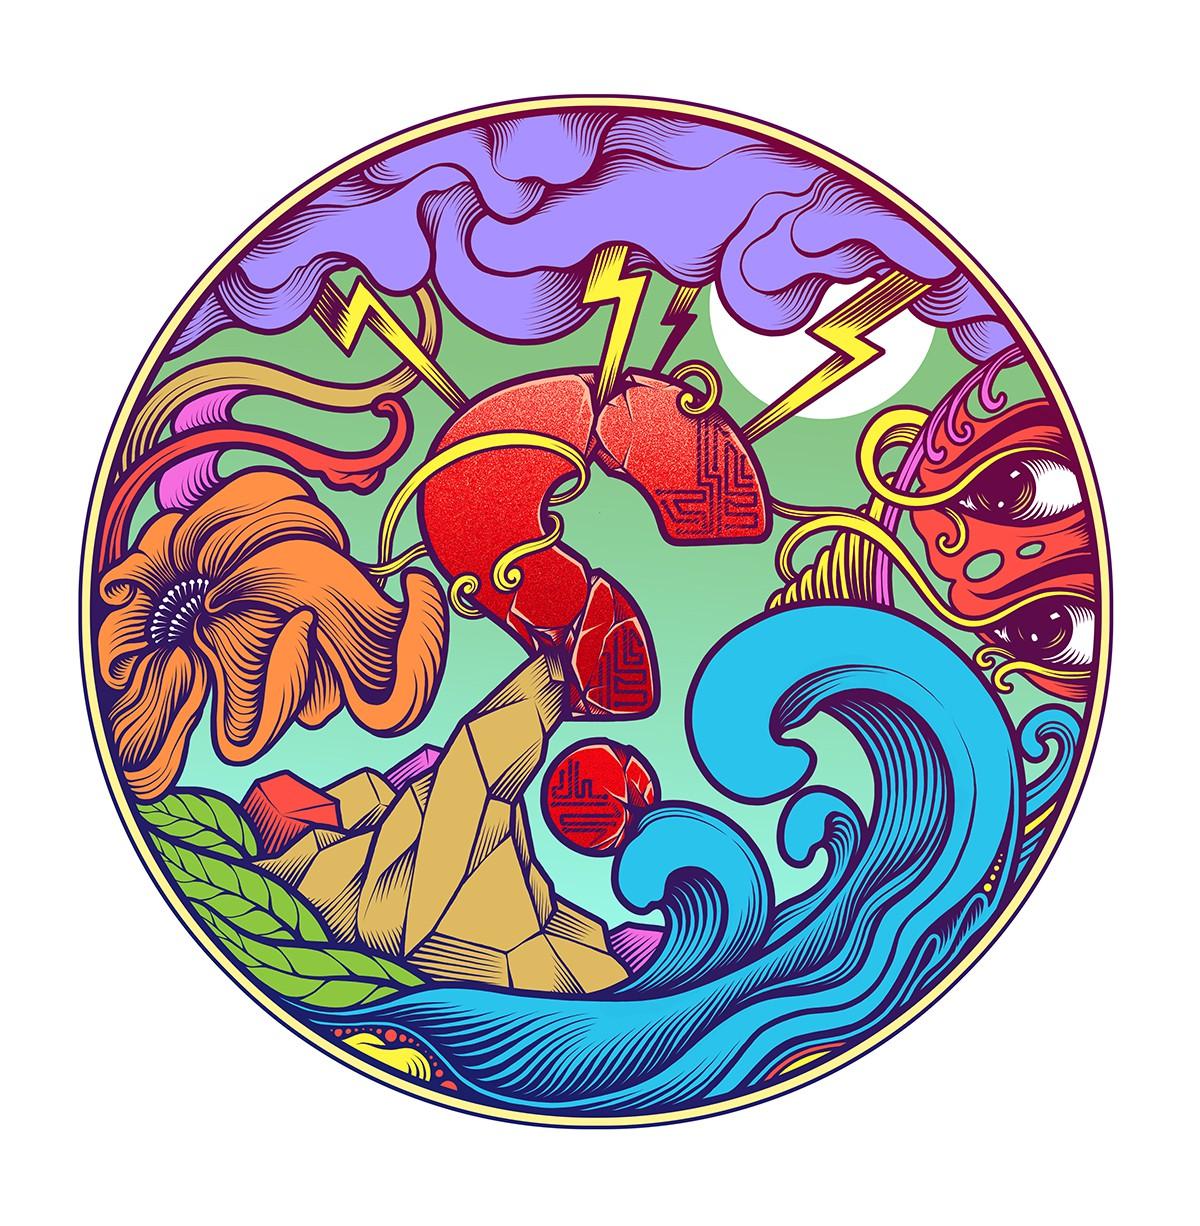 Design a logo for my teacherspayteachers.com store